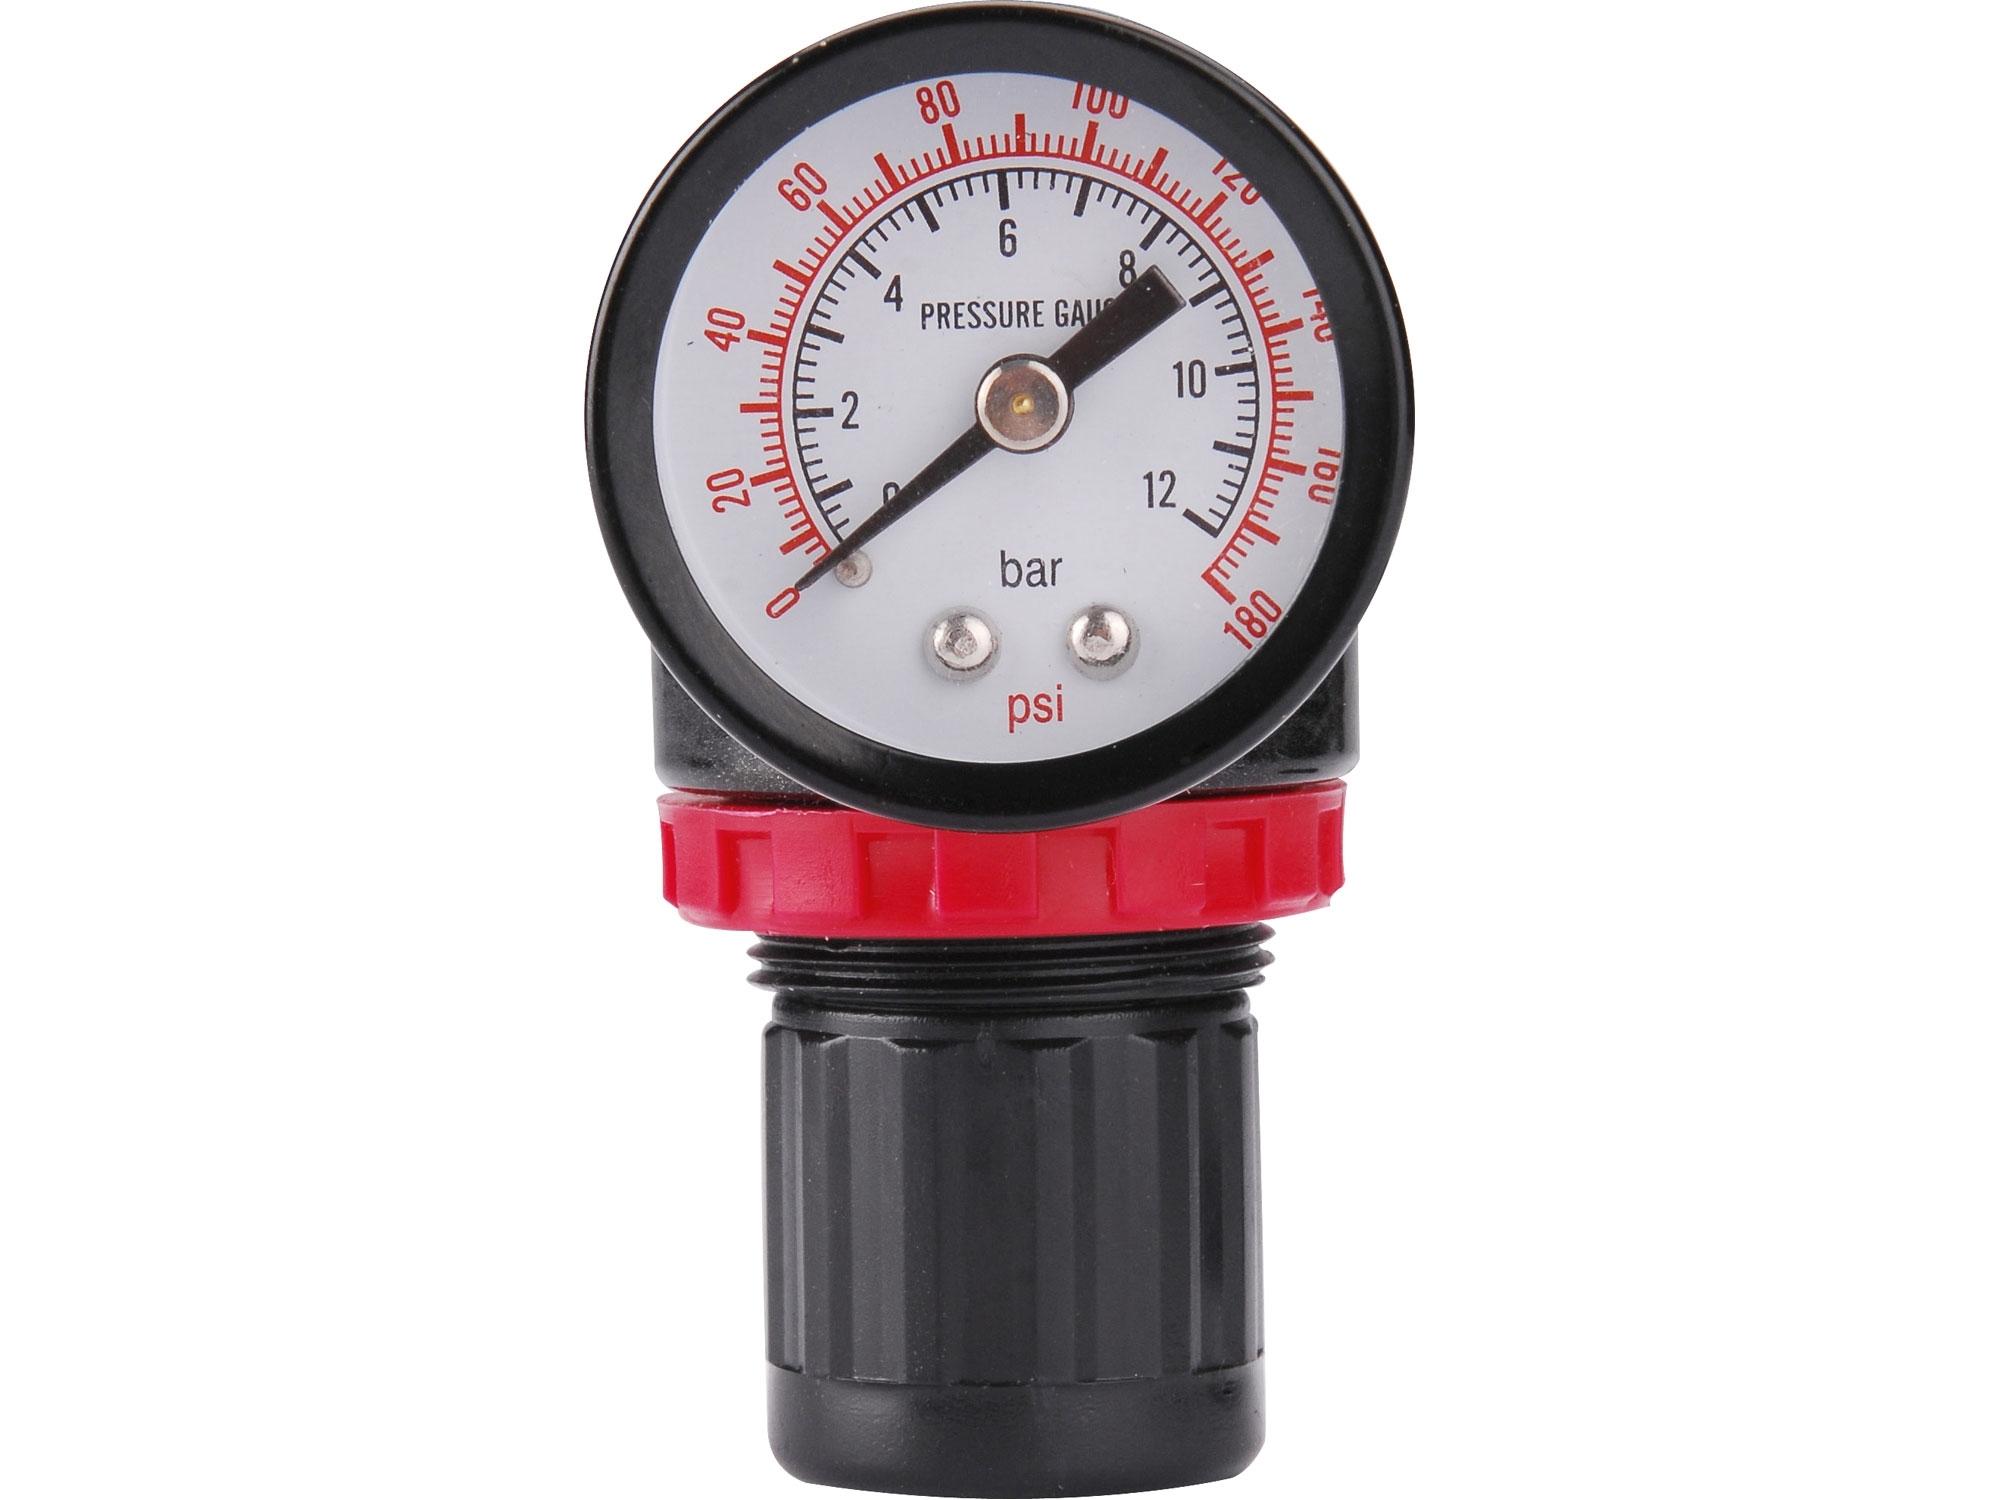 Regulátor tlaku vzduchu Extol 8865103